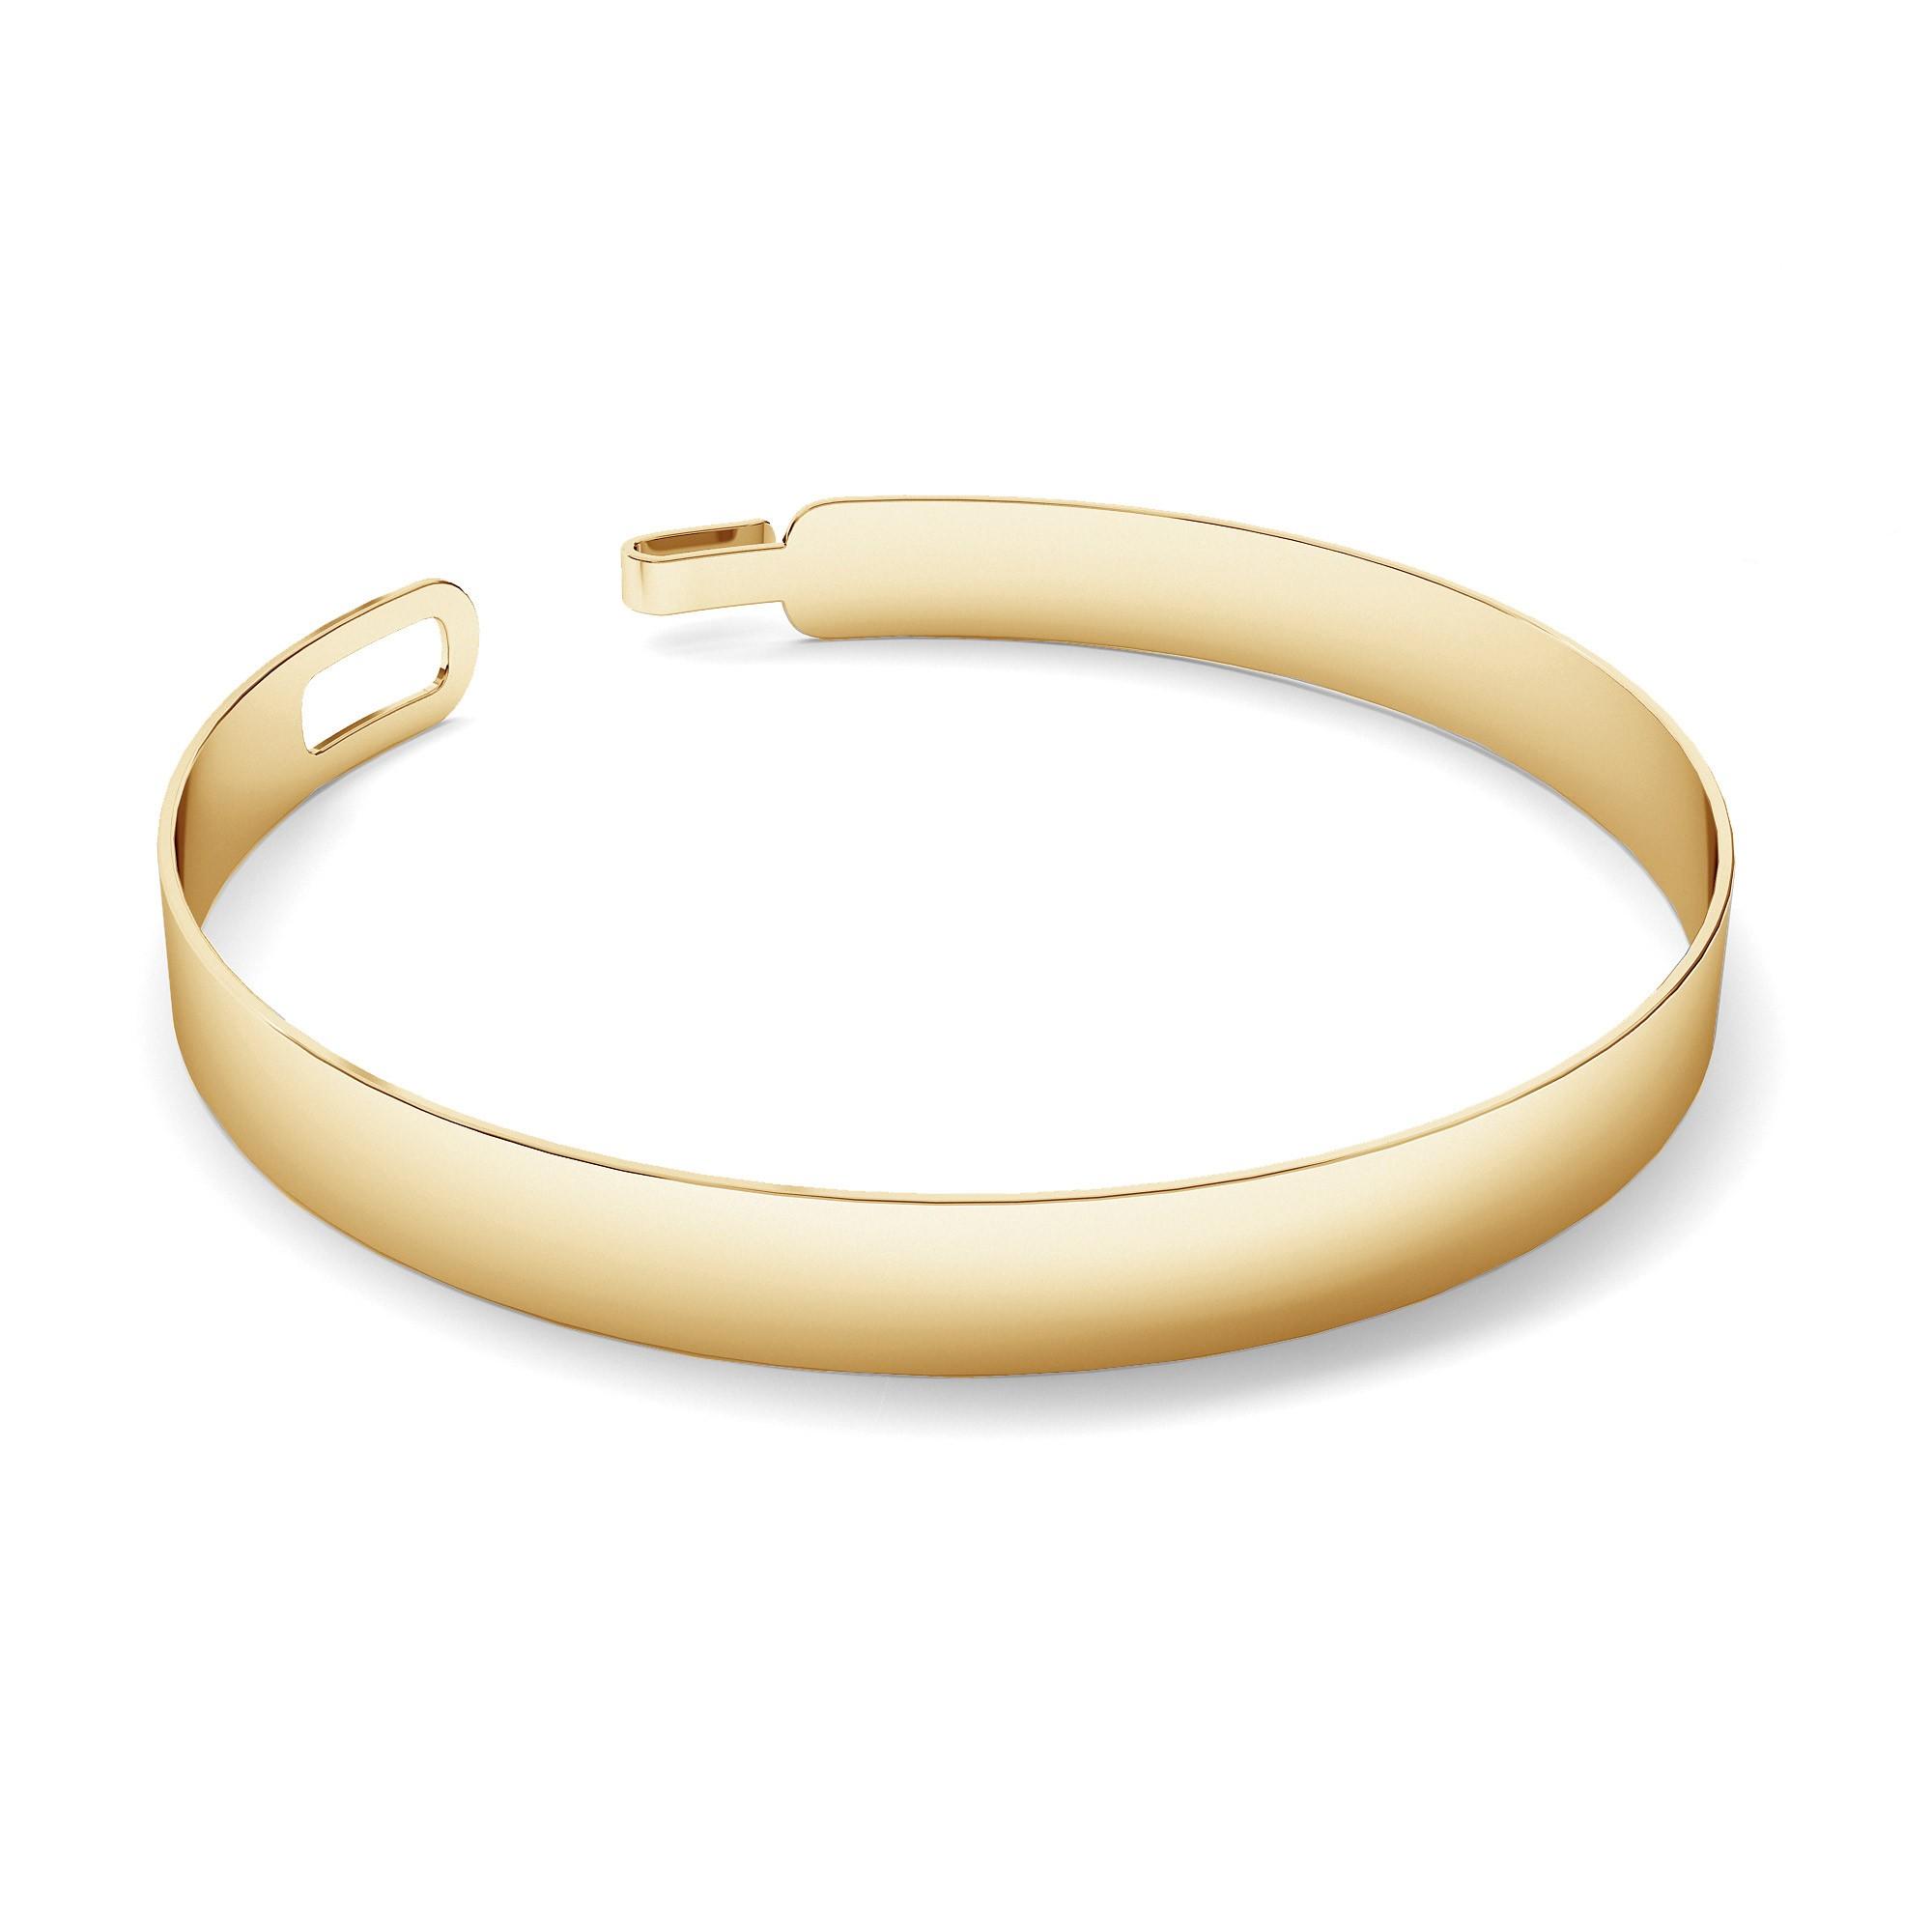 Unisex bangle bracelet, glossy sterling silver 925